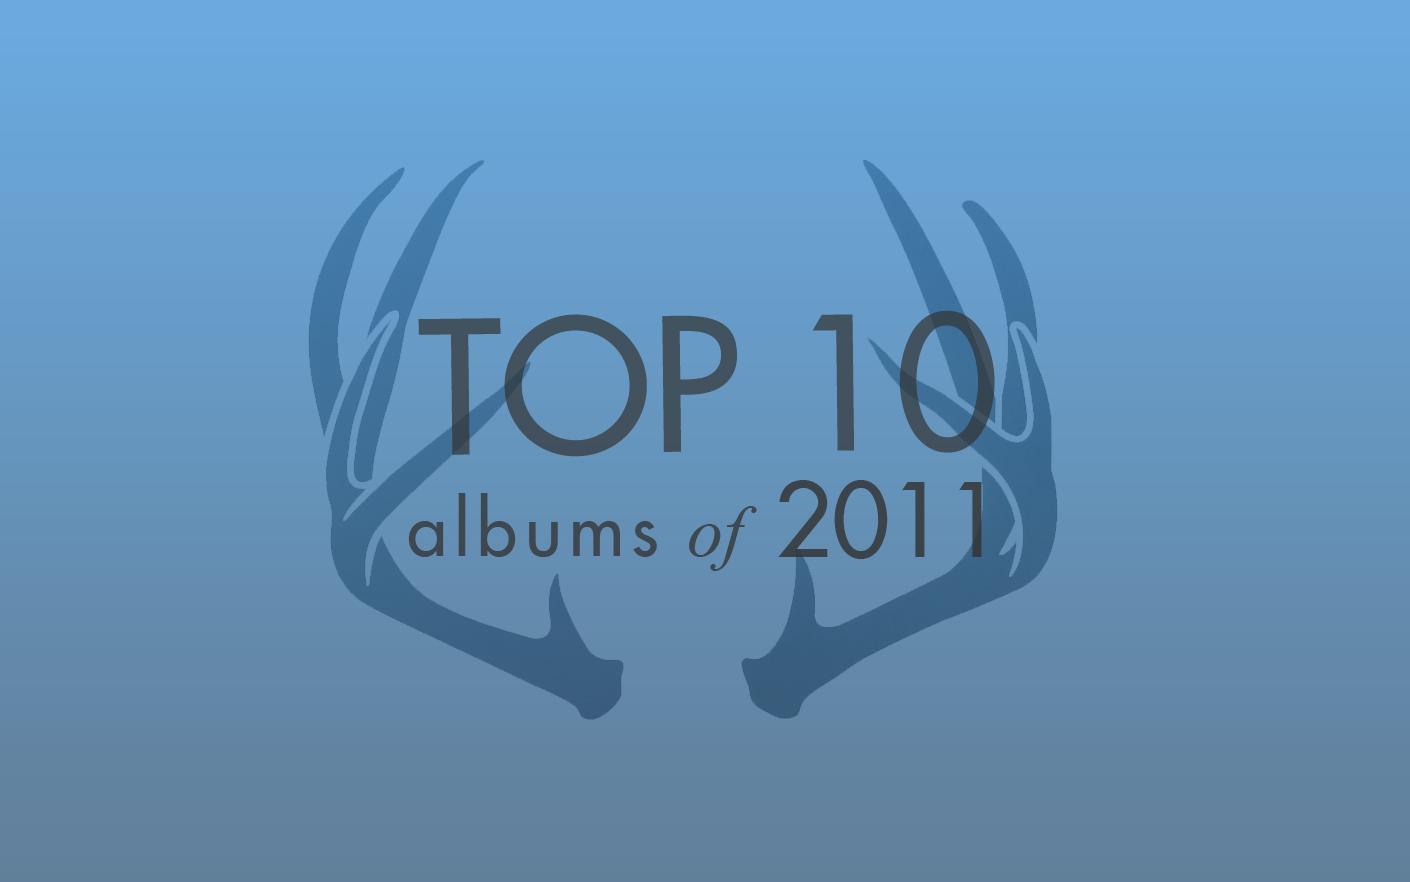 Discosalt Best Albums of 2011